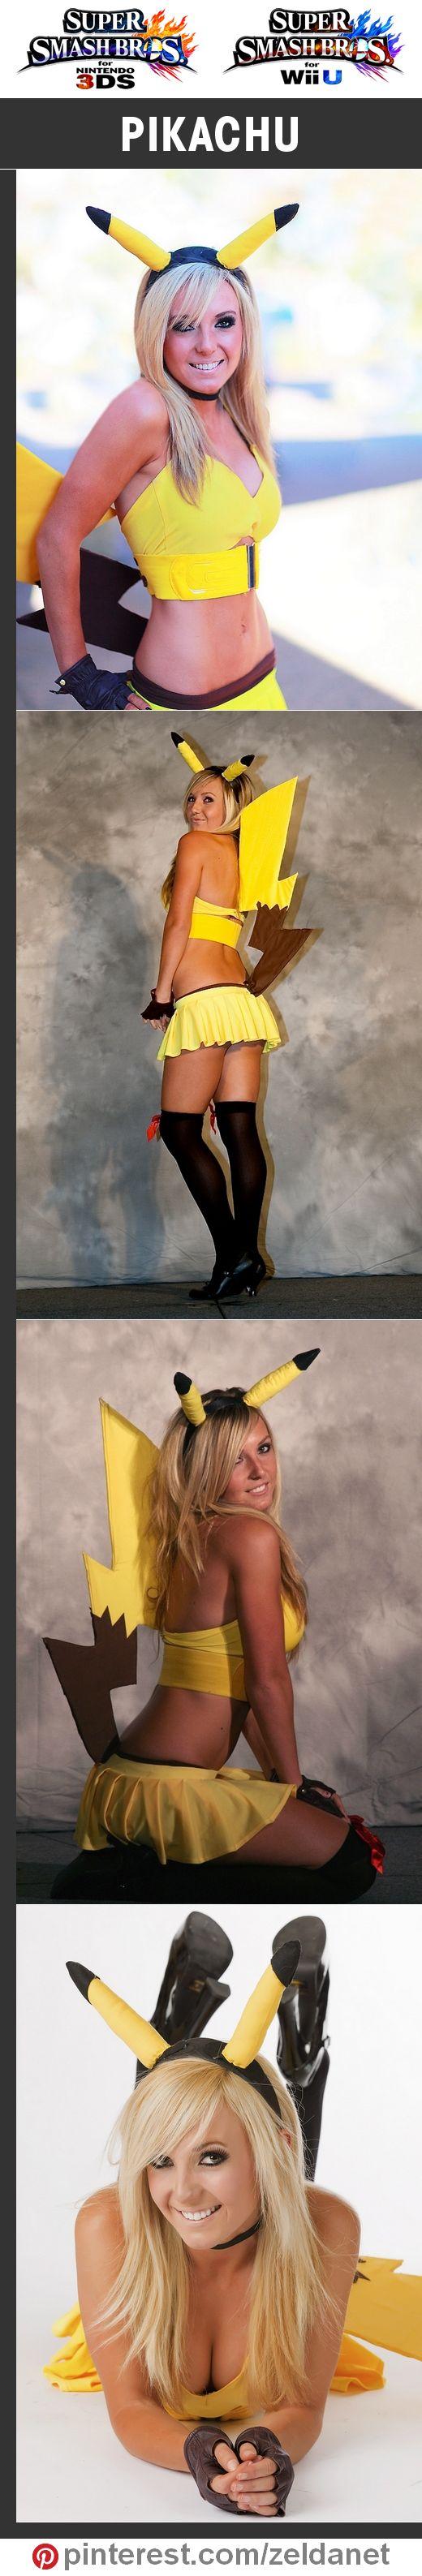 Pikachu by @nigriplease in Super Smash Bros cosplay series   #Nintendo #3DS #WiiU #Pokemon http://www.pinterest.com/zeldanet/super-smash-bros-cosplay-series/